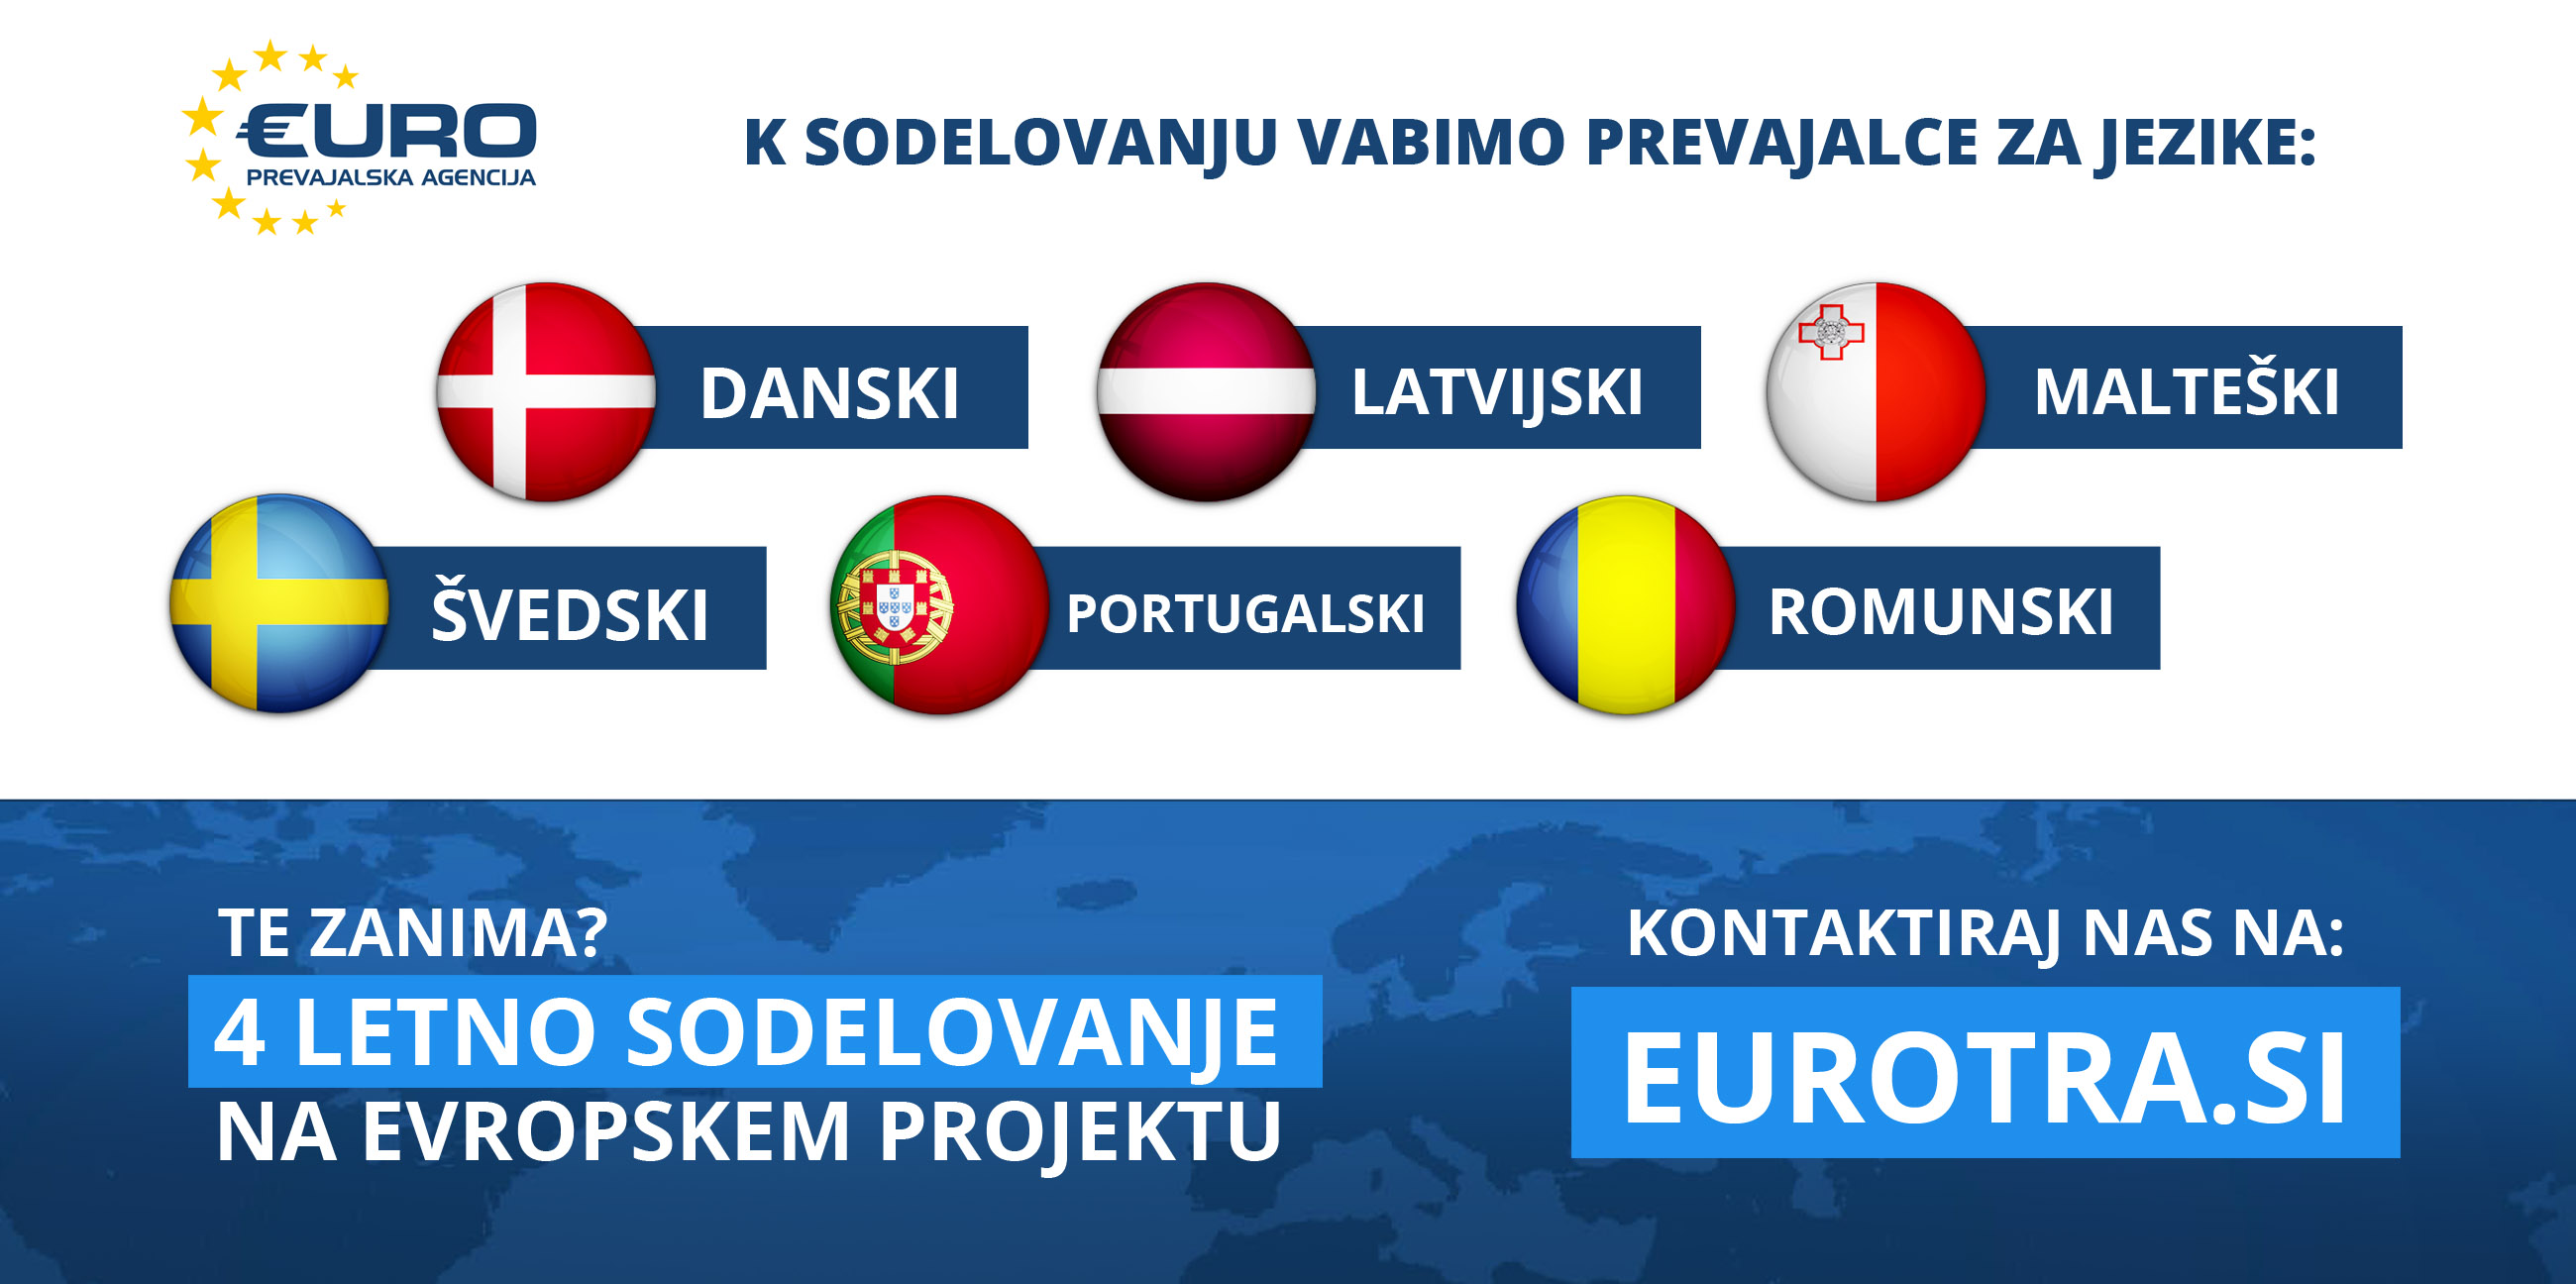 Eurotra - Freelancerji Prevajalci EU